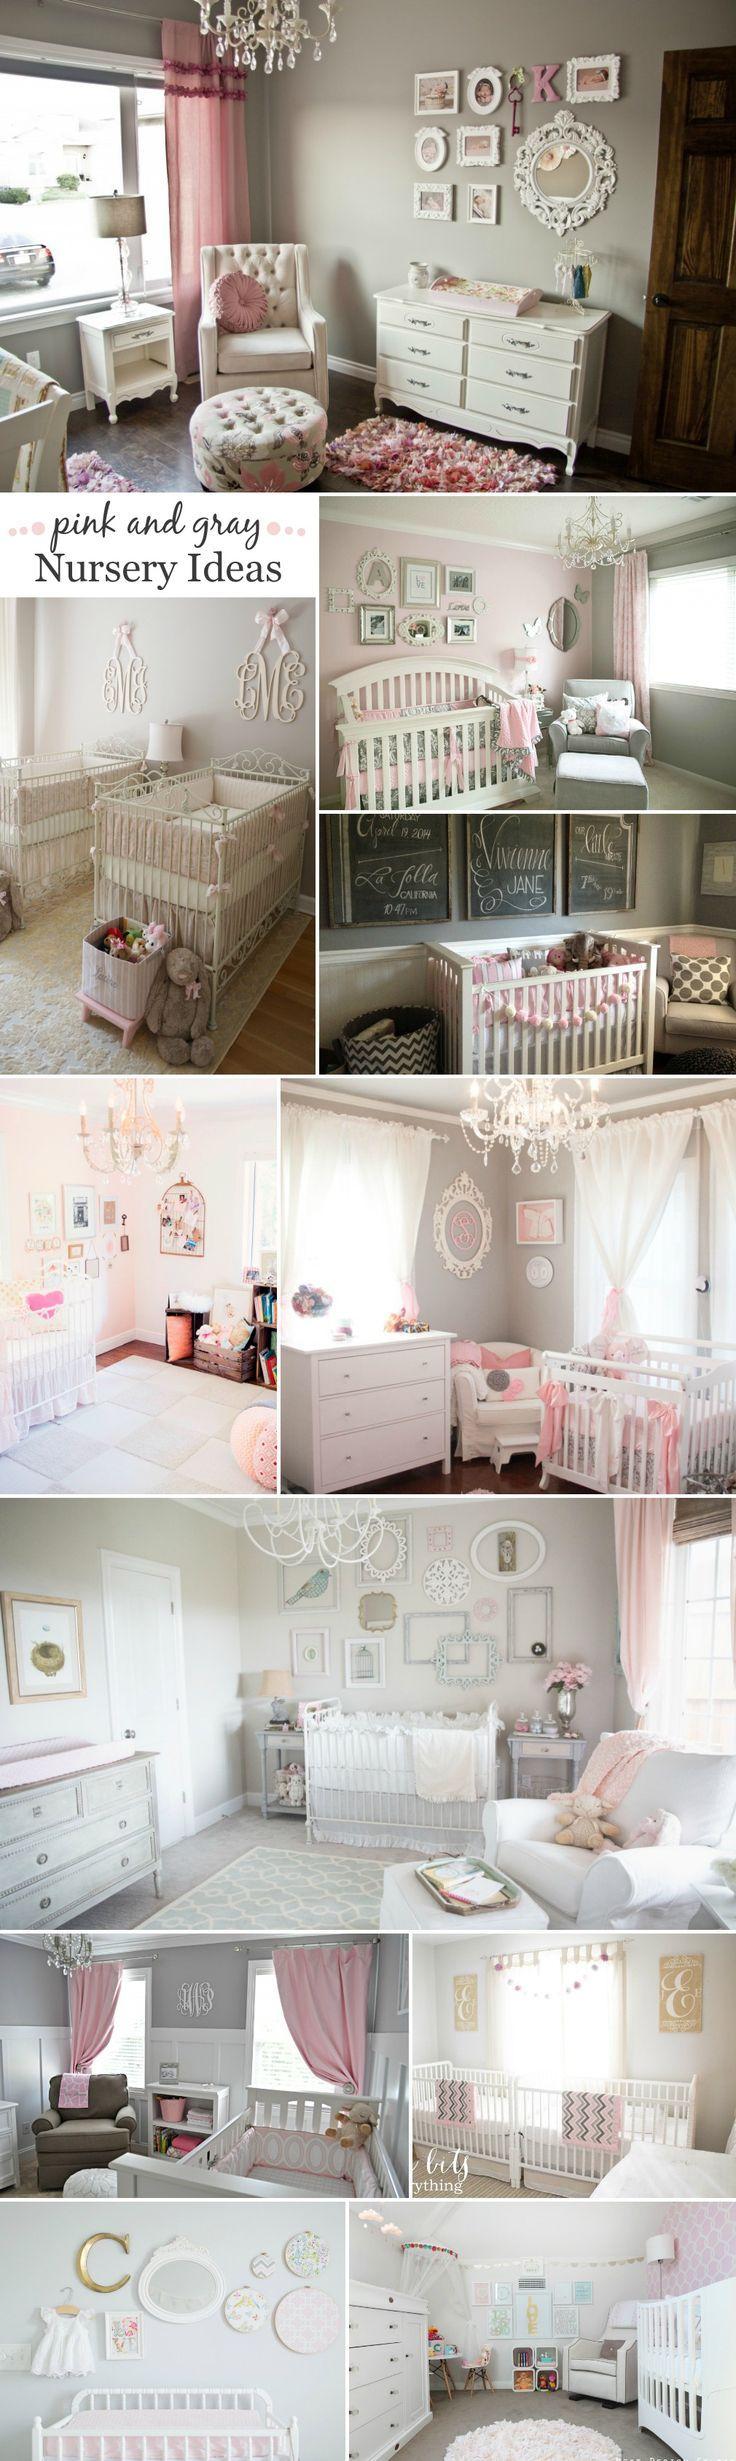 Pink and Gray Nursery Ideas - 11 looks we love! | www.homeology.co.za